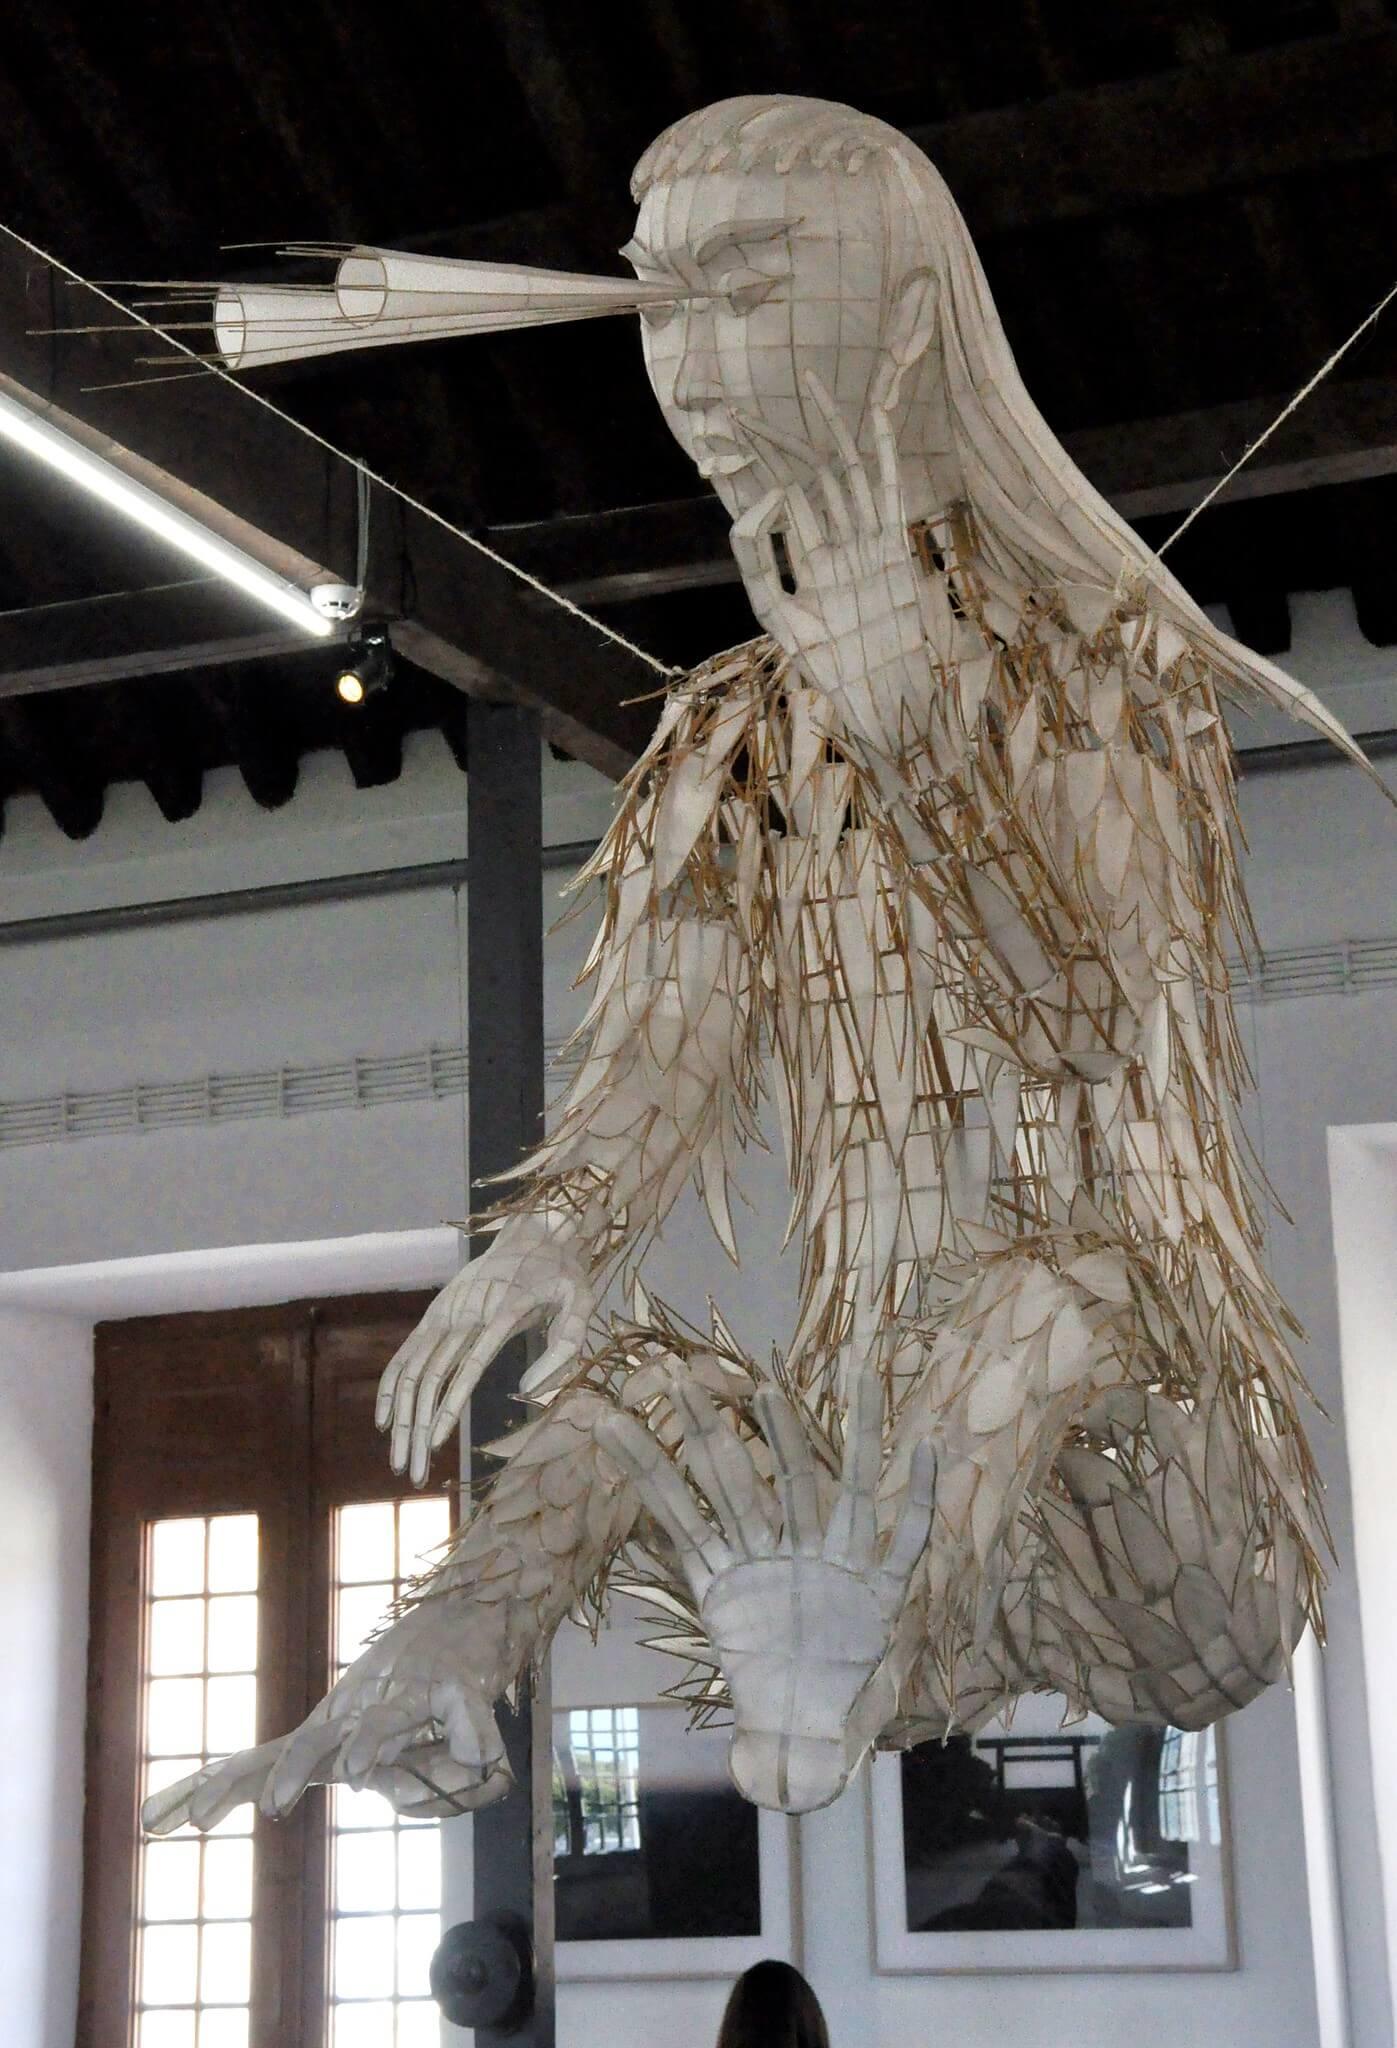 Lisboa - Cordoaria Nacional 'Rapture', a major exhibition by Ai Weiwei